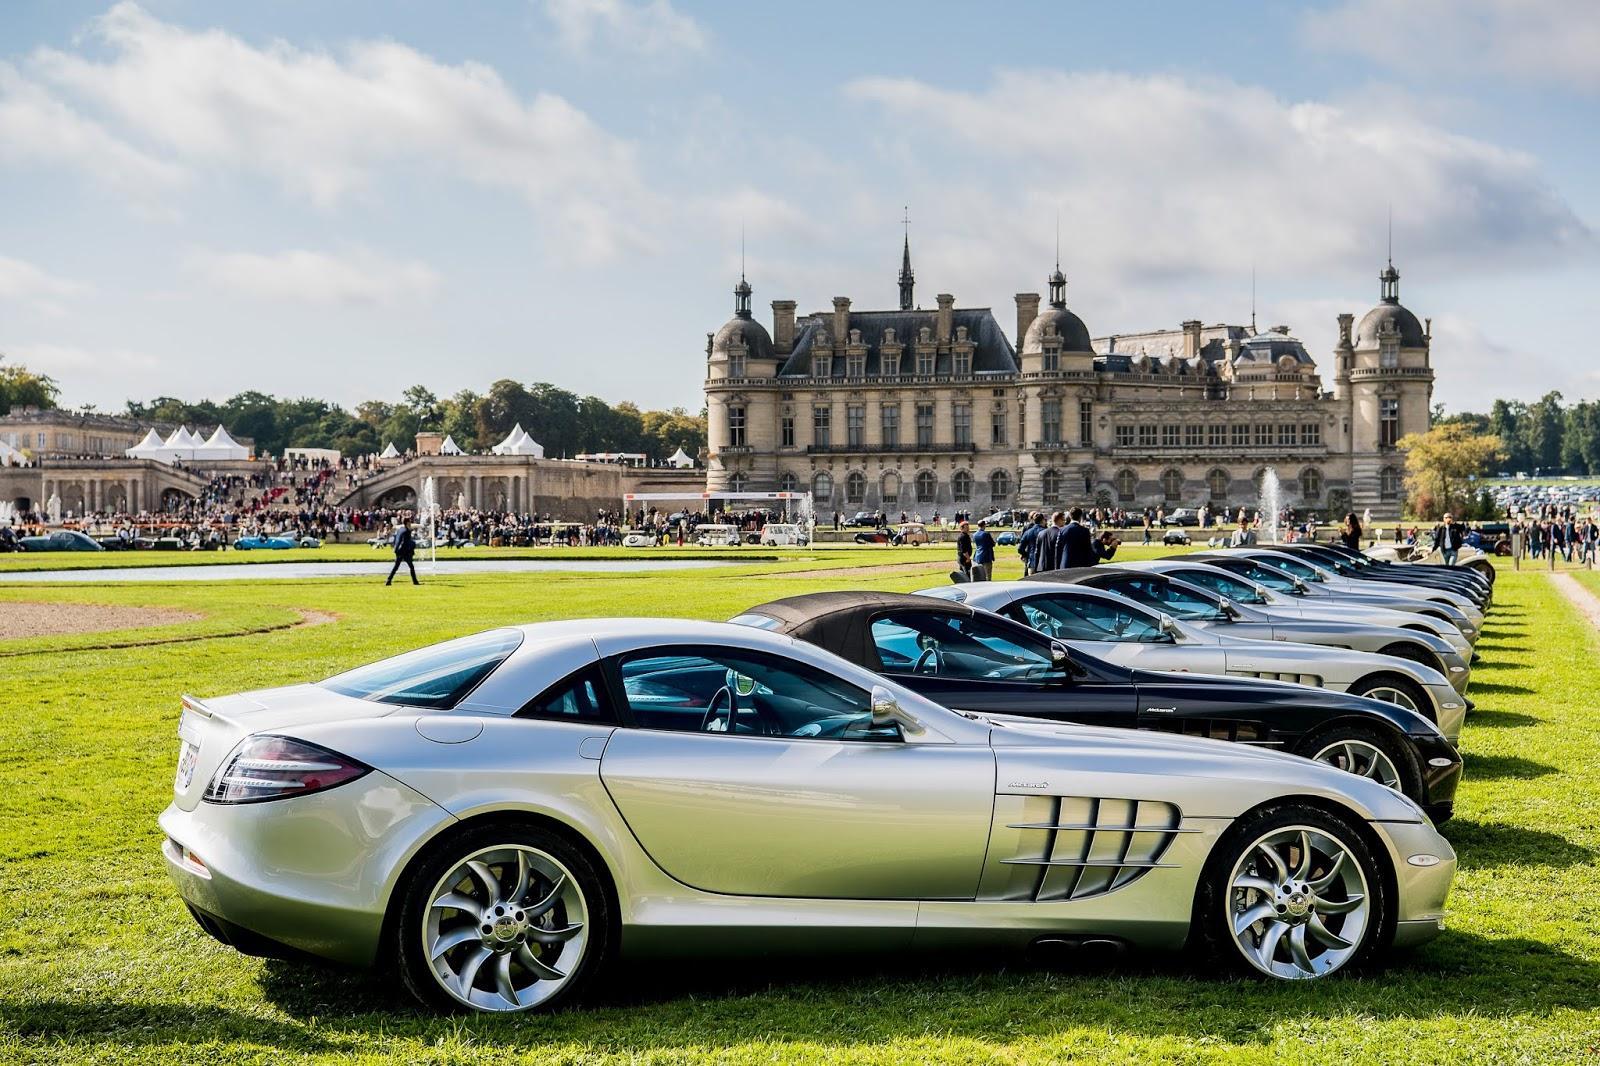 17C760 01 Ποια είναι η θρυλική 300 SLR 300 SLR, Benz, Mercedes, Mercedes Benz, retrocar, retrocar sunday, vintage, zblog